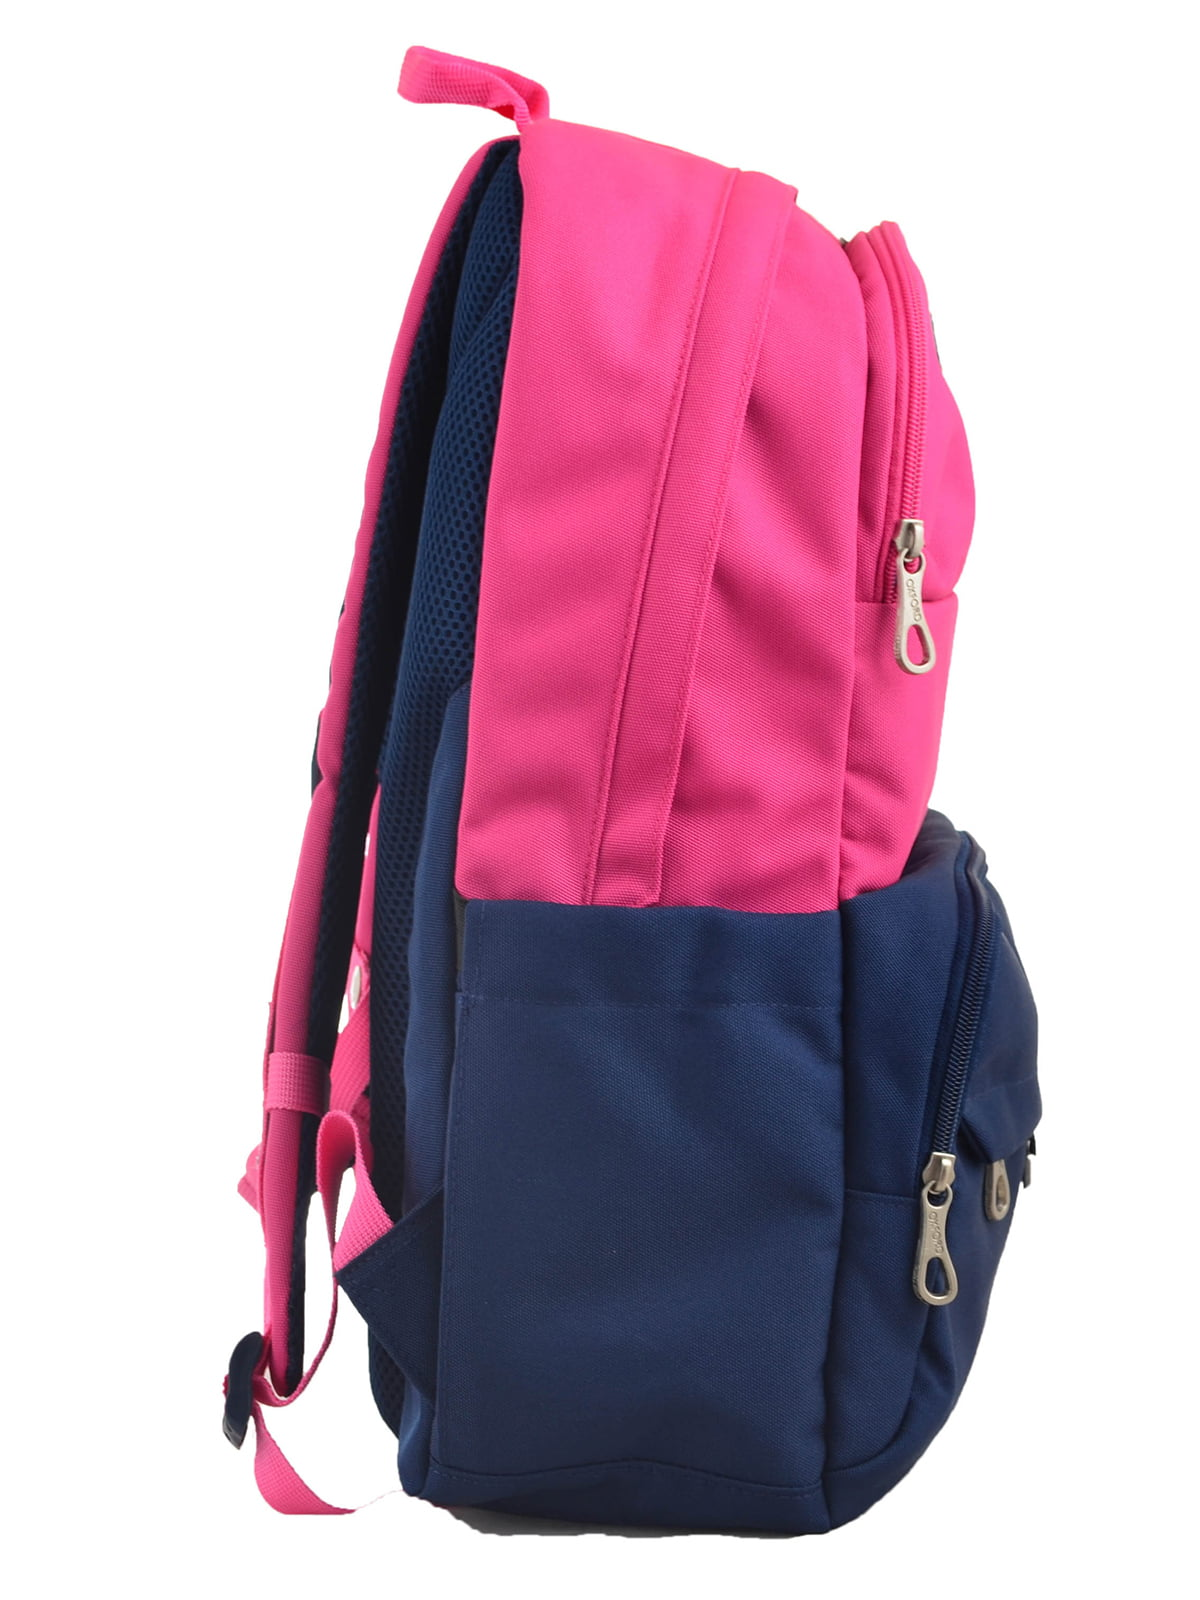 Рюкзак синьо-рожевий | 4214891 | фото 2